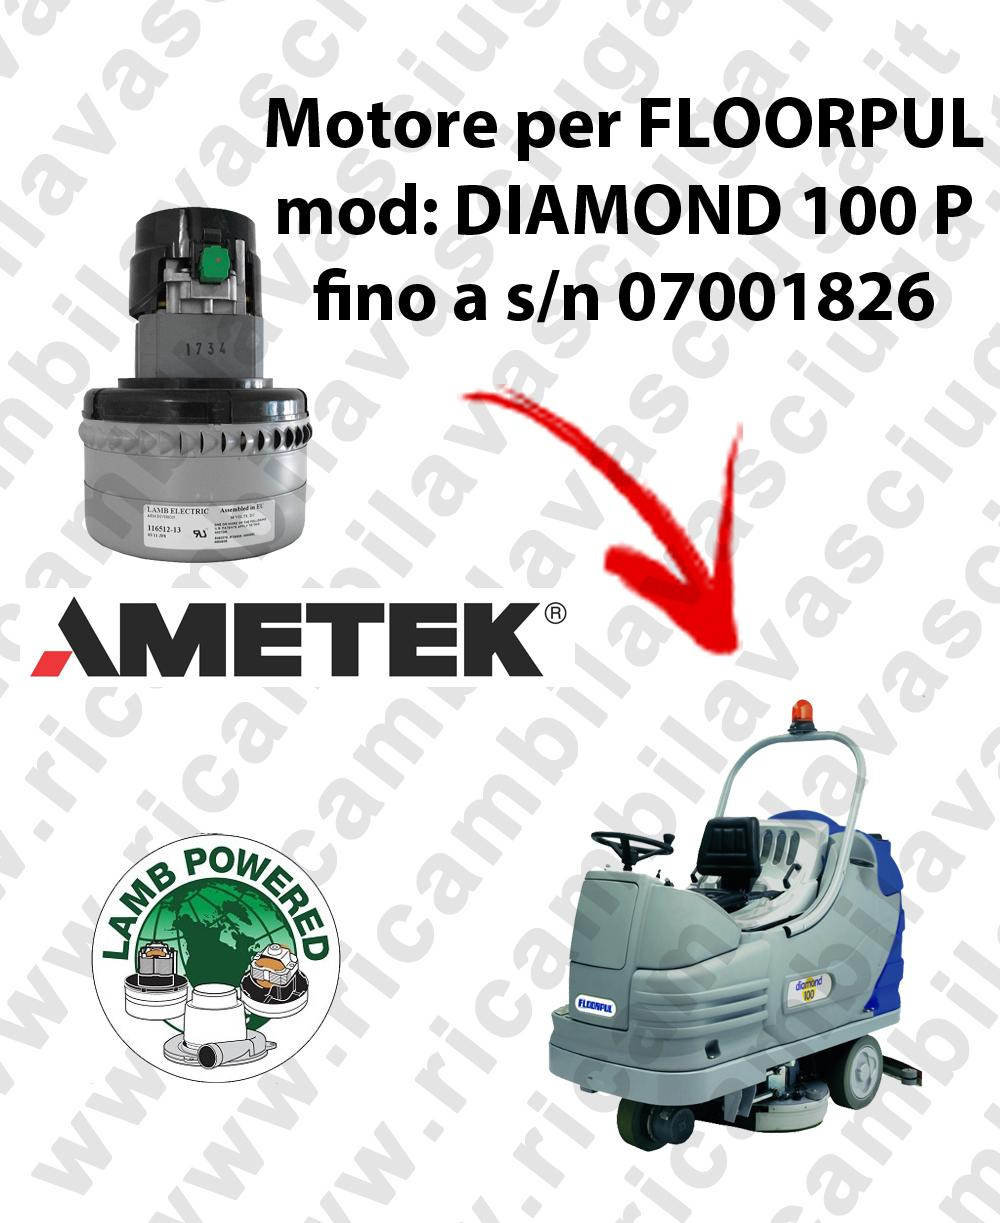 DIAMOND 100 P fino a s/n 07001826 MOTORE LAMB AMETEK di aspirazione per lavapavimenti FLOORPUL